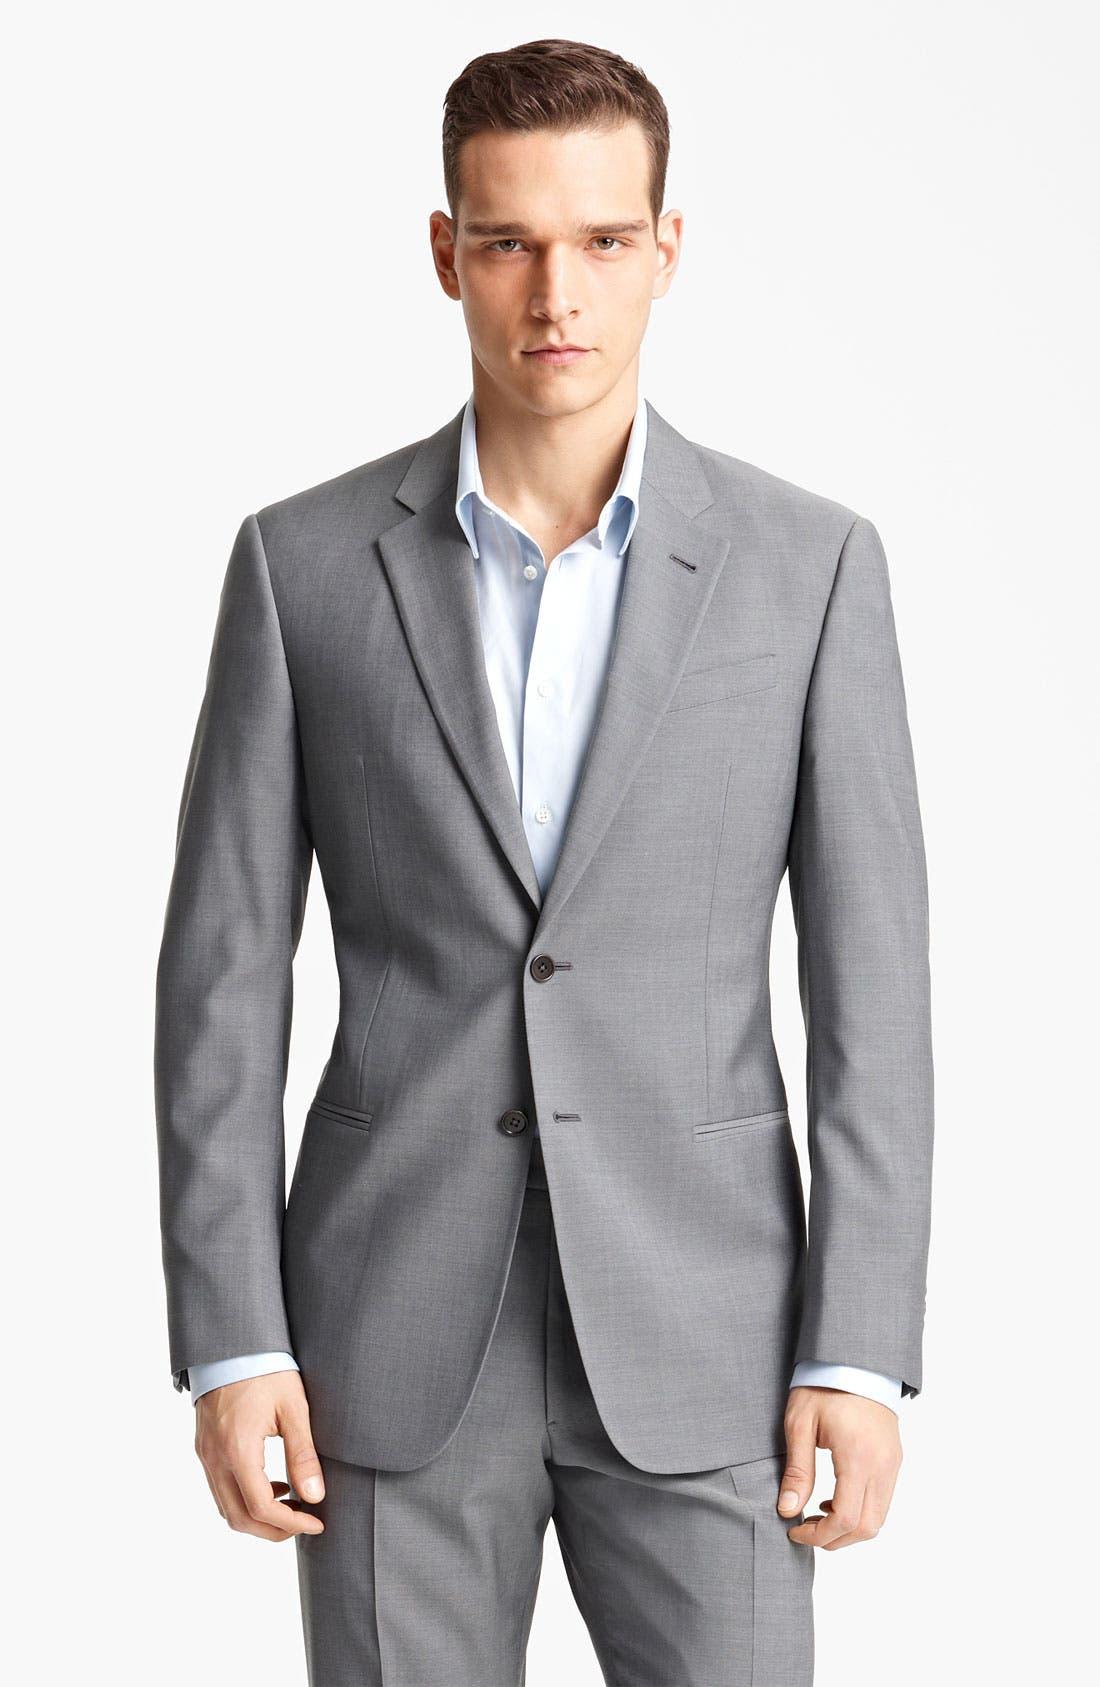 Alternate Image 1 Selected - Armani Collezioni 'Giorgio' Trim Fit Suit